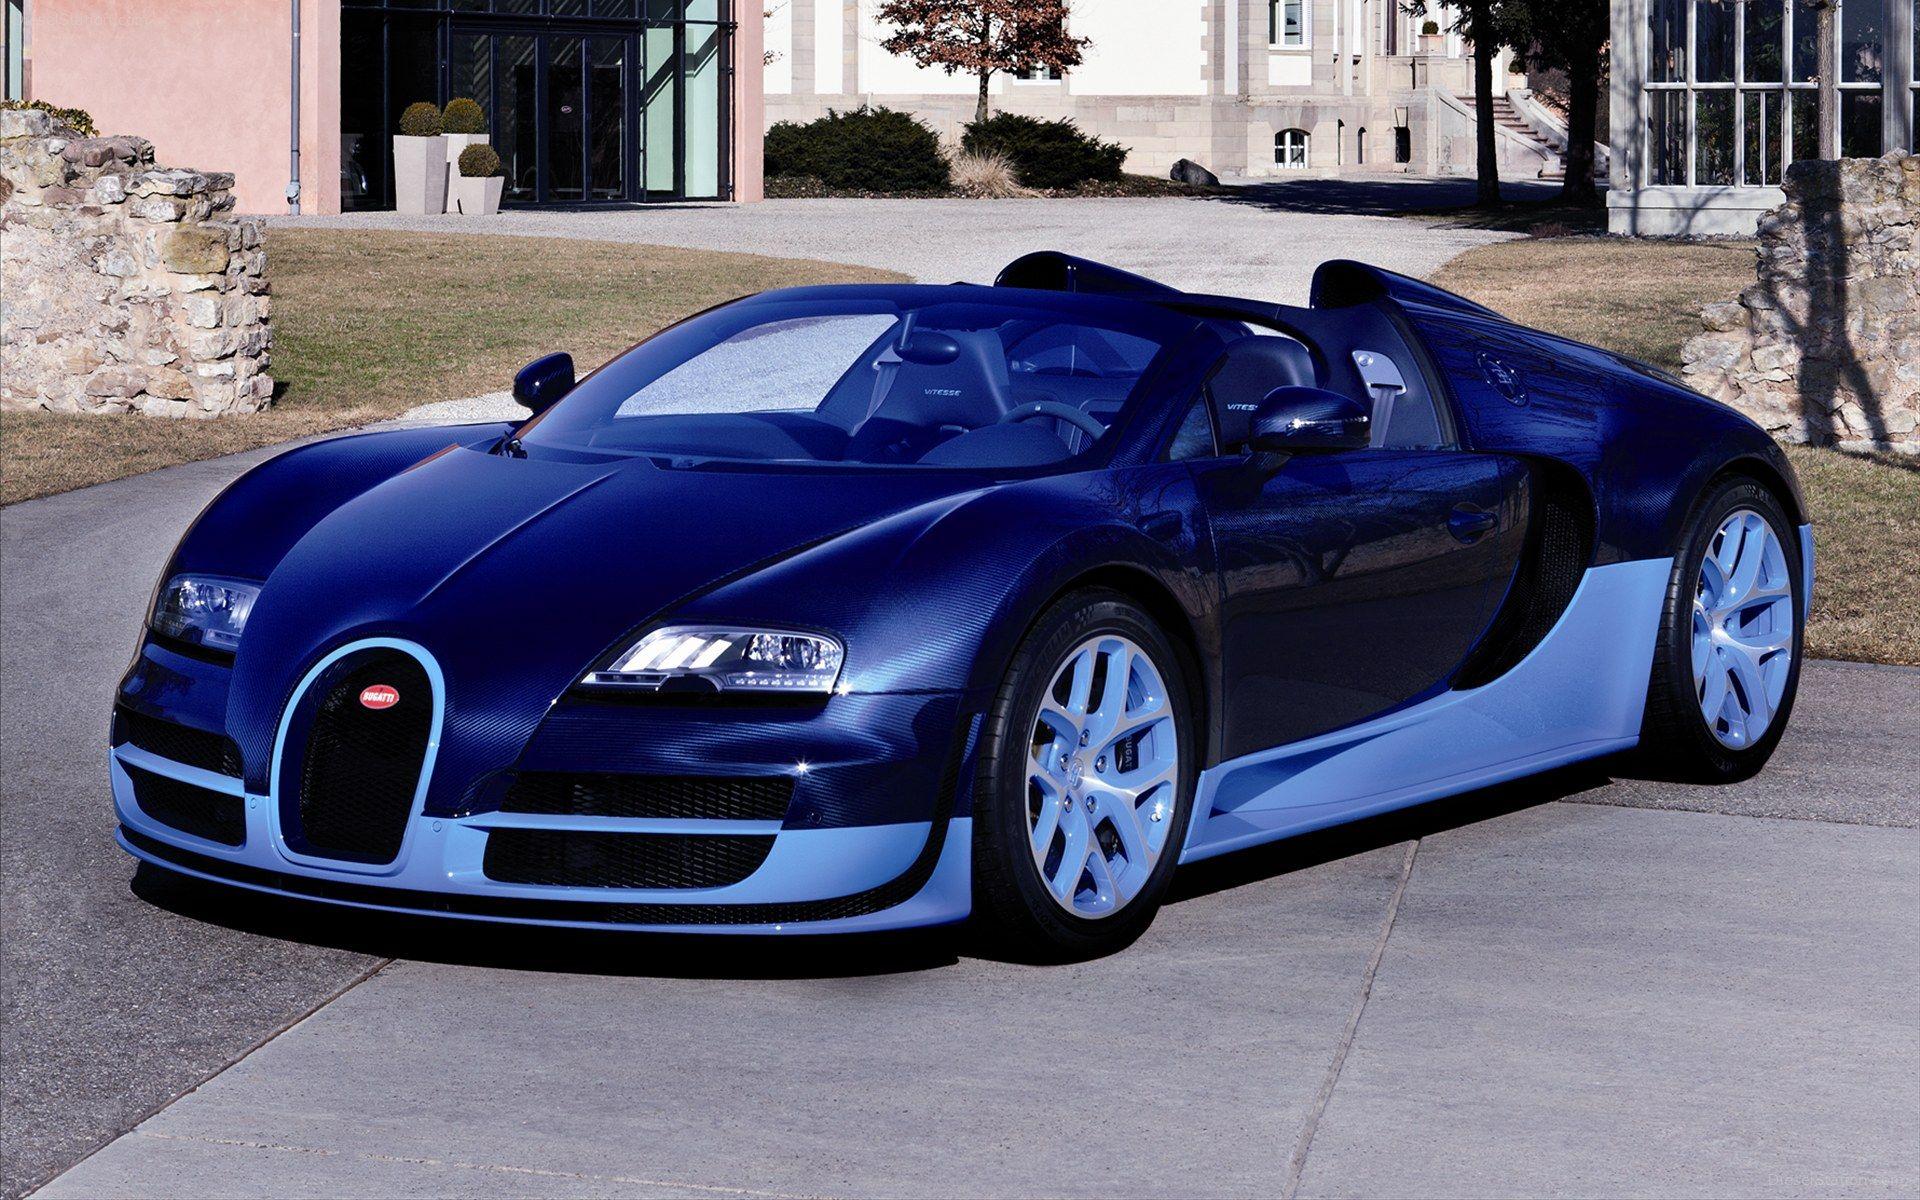 350300ed9b4bbb9e03982790bb5afc4e Cozy Bugatti Veyron W16 Engine Price Cars Trend